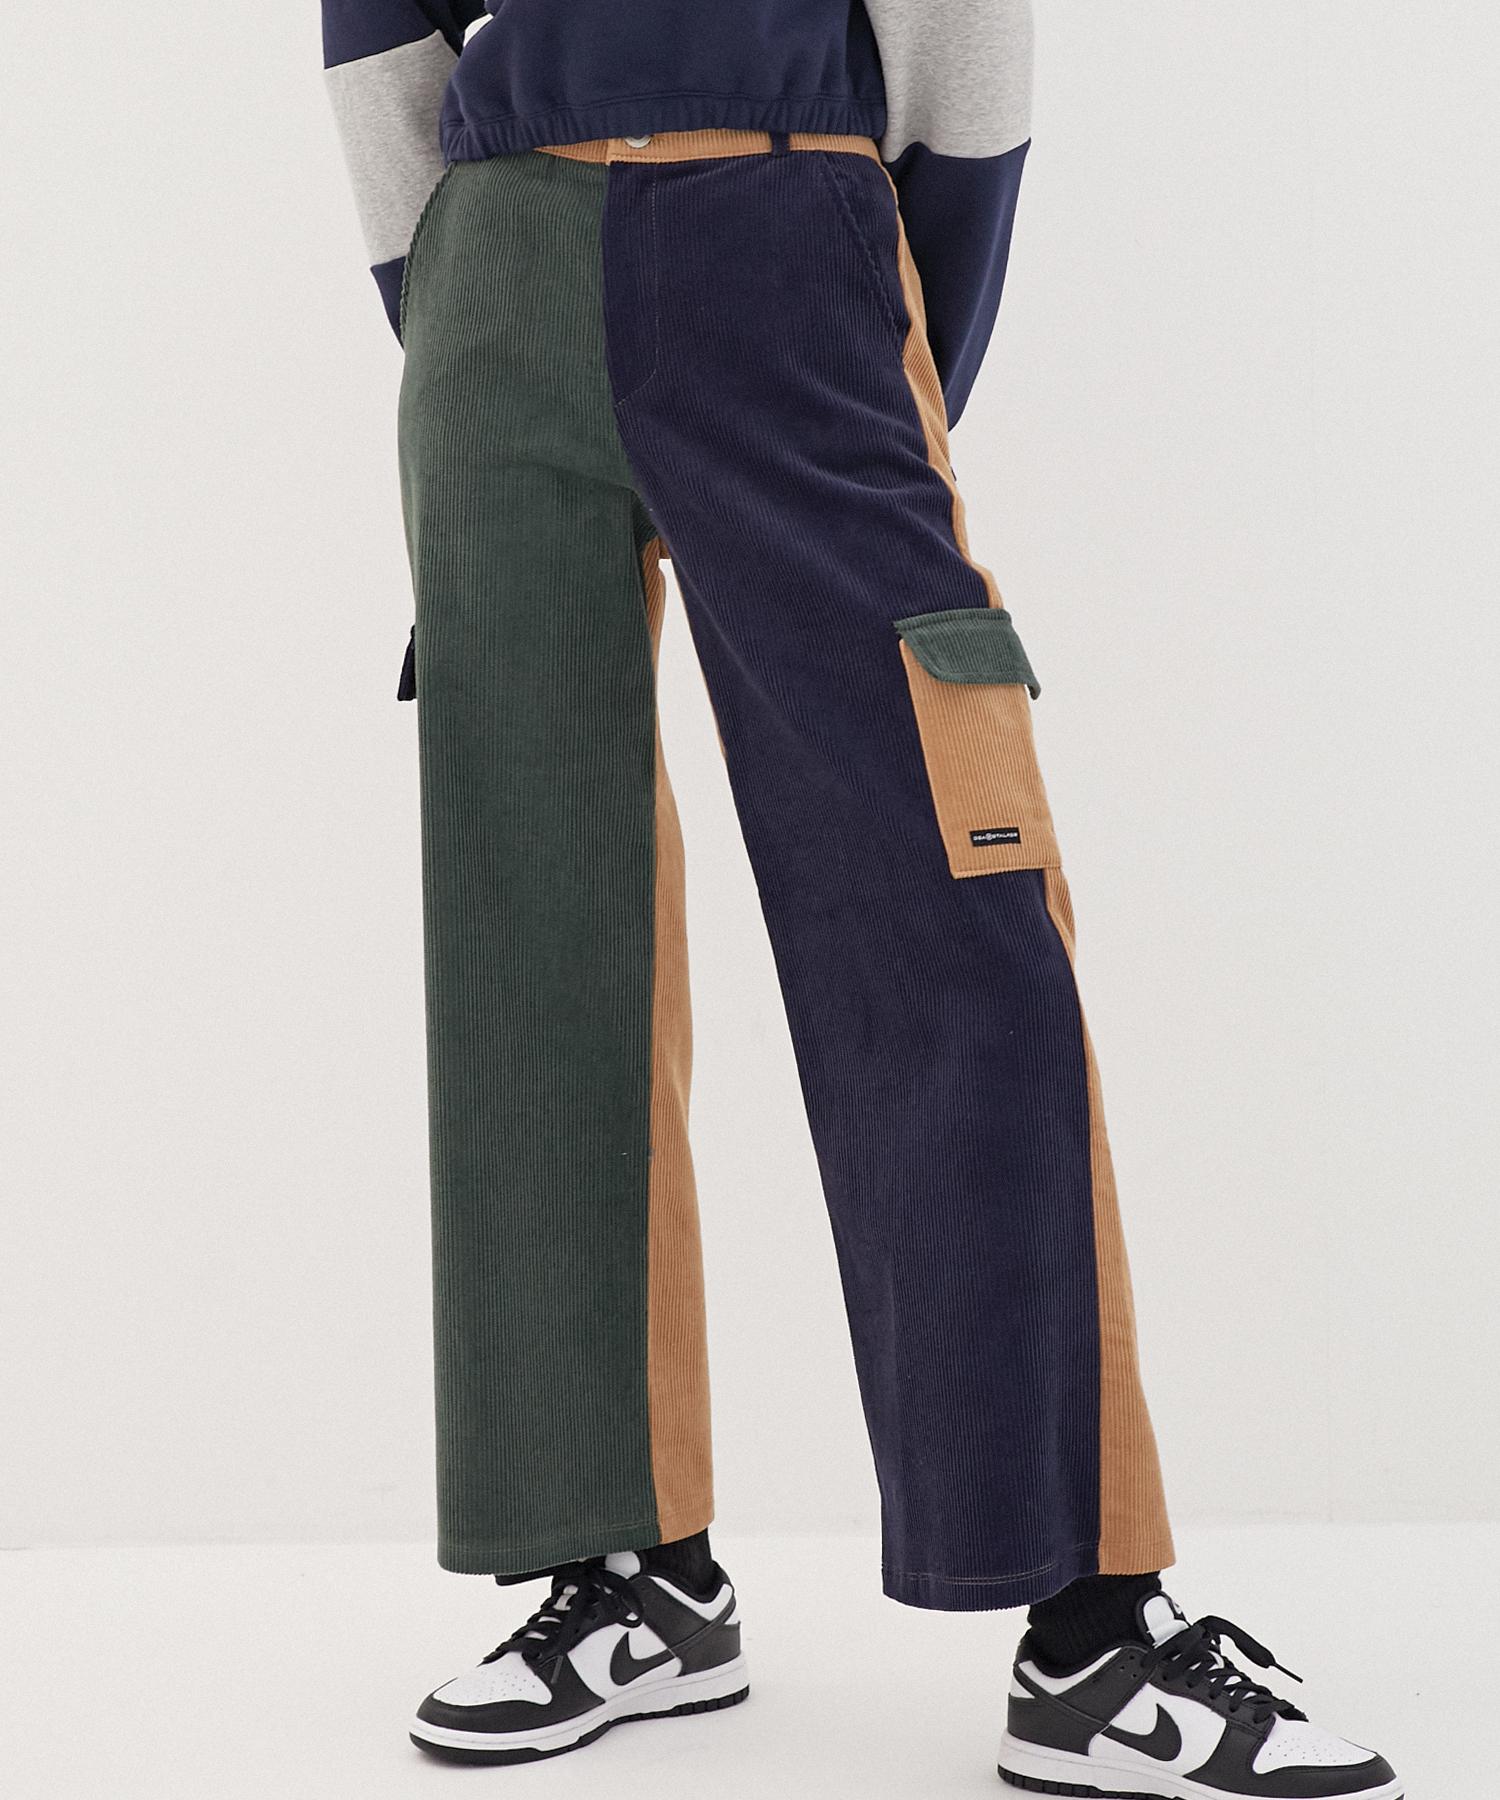 SERIES CORDUROY PANTS (시리즈 코듀로이 팬츠) - BROWN